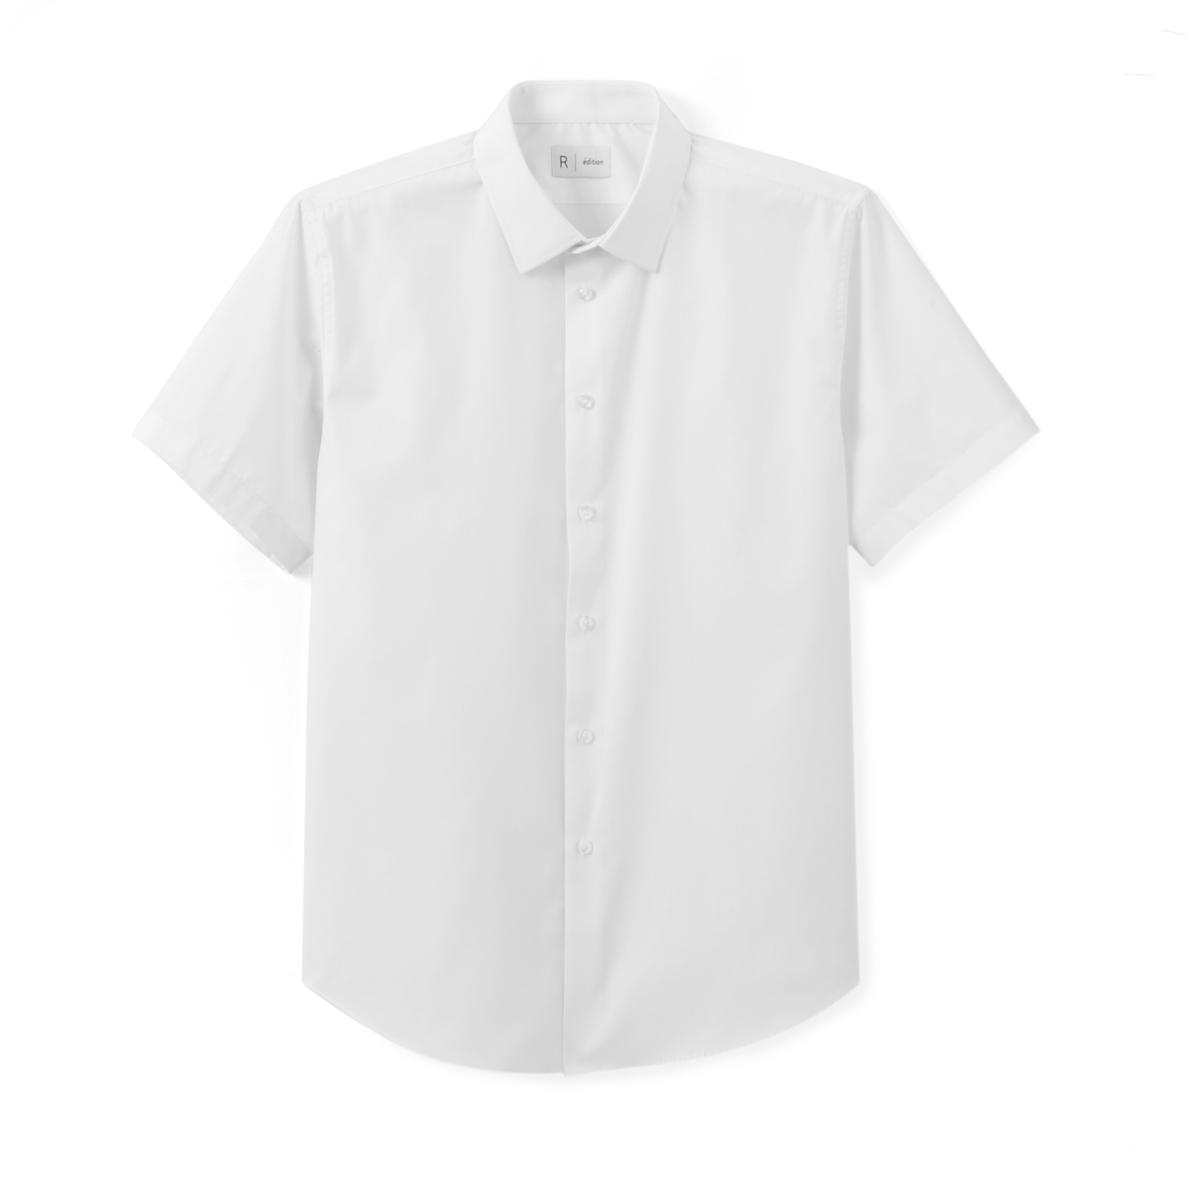 Рубашка La Redoute Collections 47493 от LaRedoute